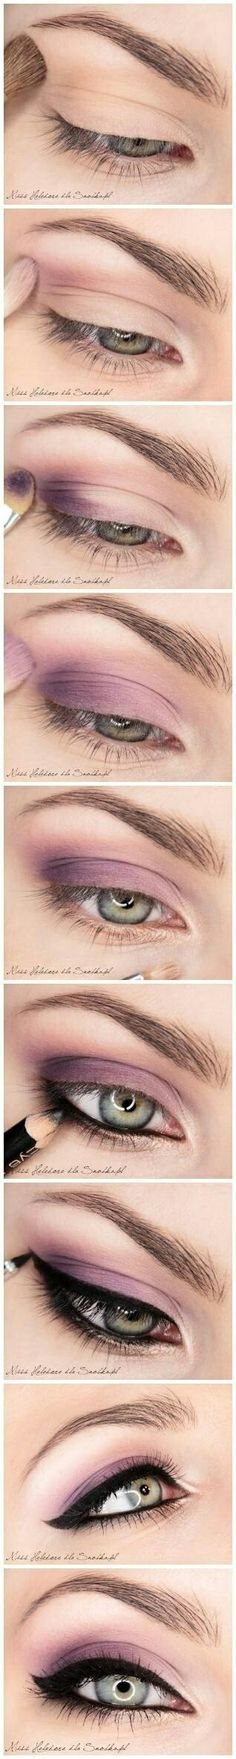 Lavender lilac pinkish eye shadow and liner eye make up tutorial